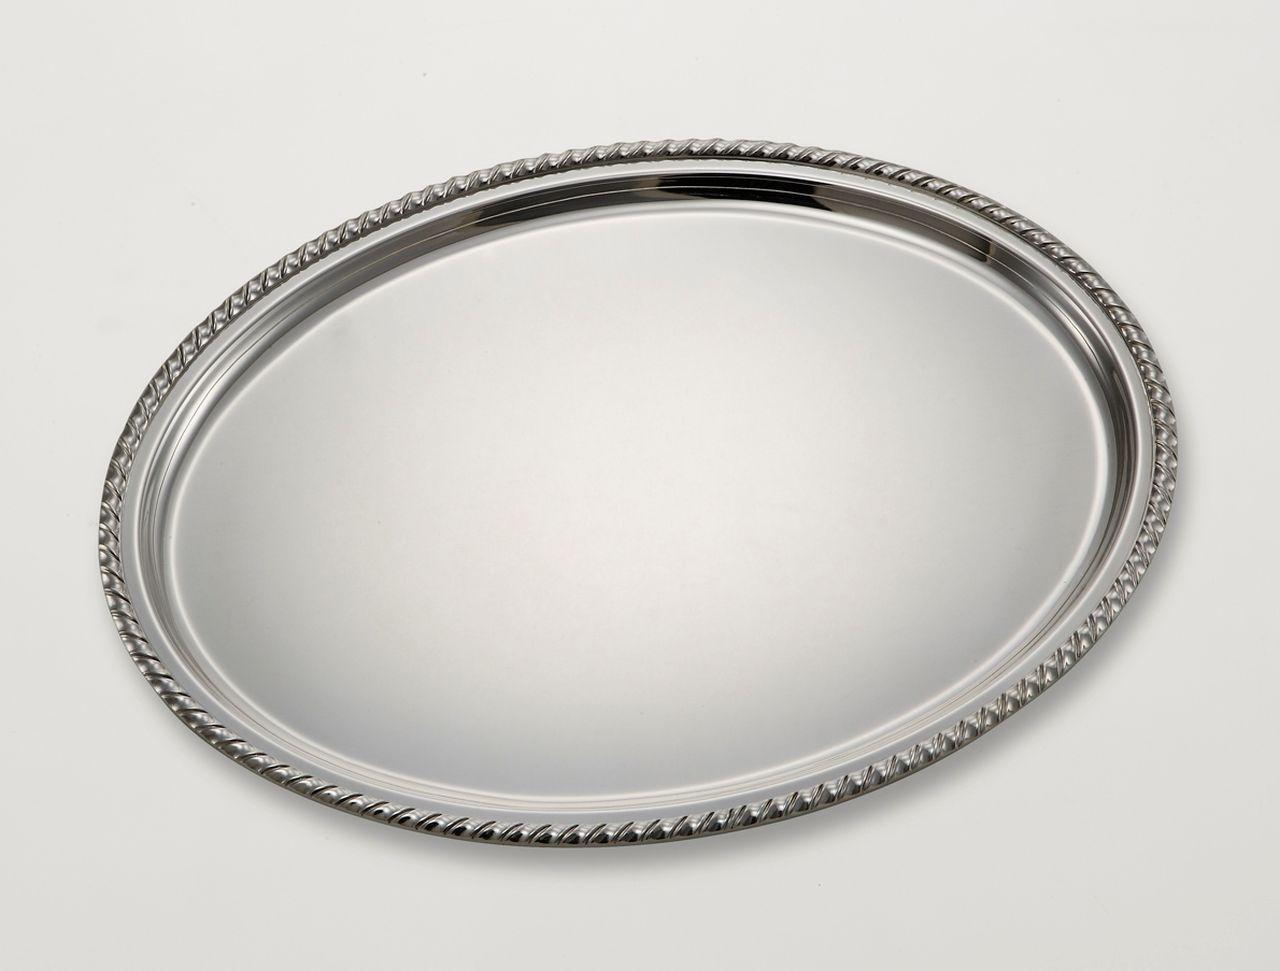 Vassoio ovale stile San Marco argentato argento cm.30x22